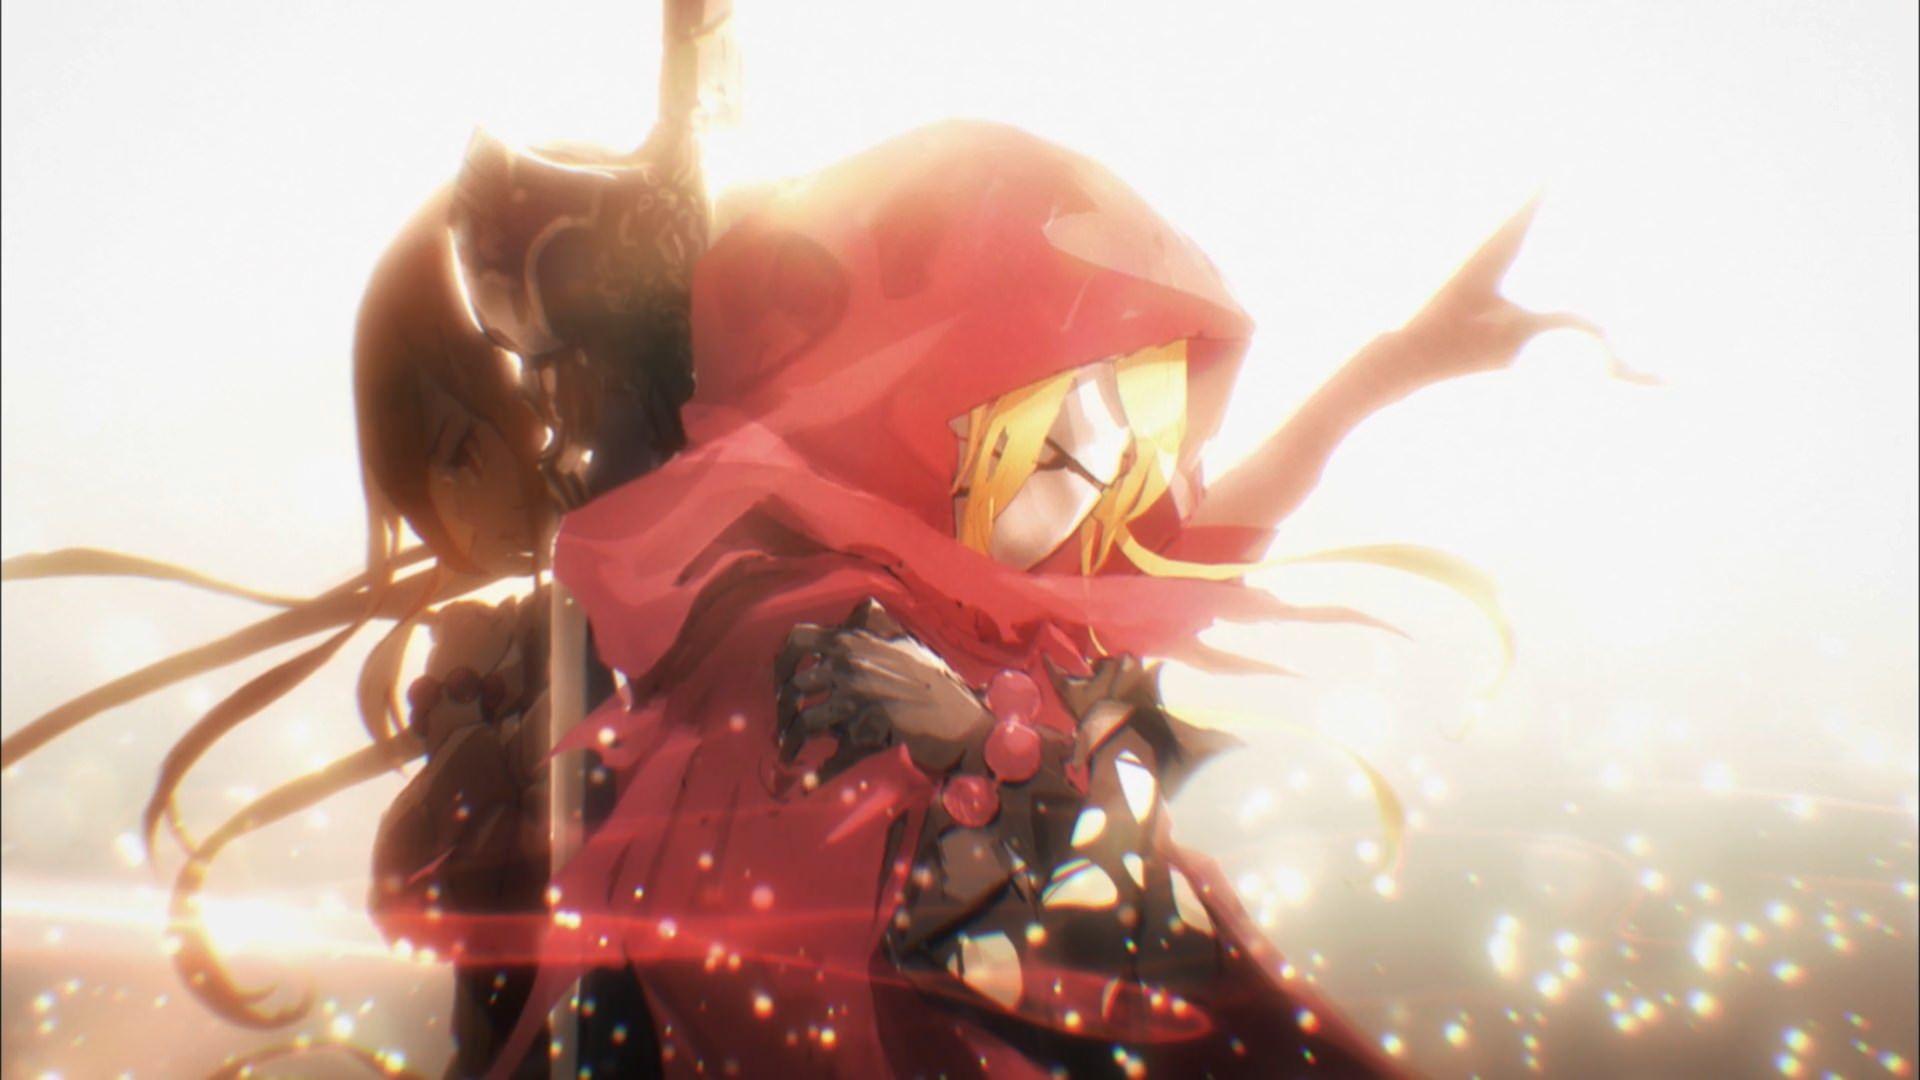 Overlord Ed Screen Shot Anime Artwork Anime Anime Titles